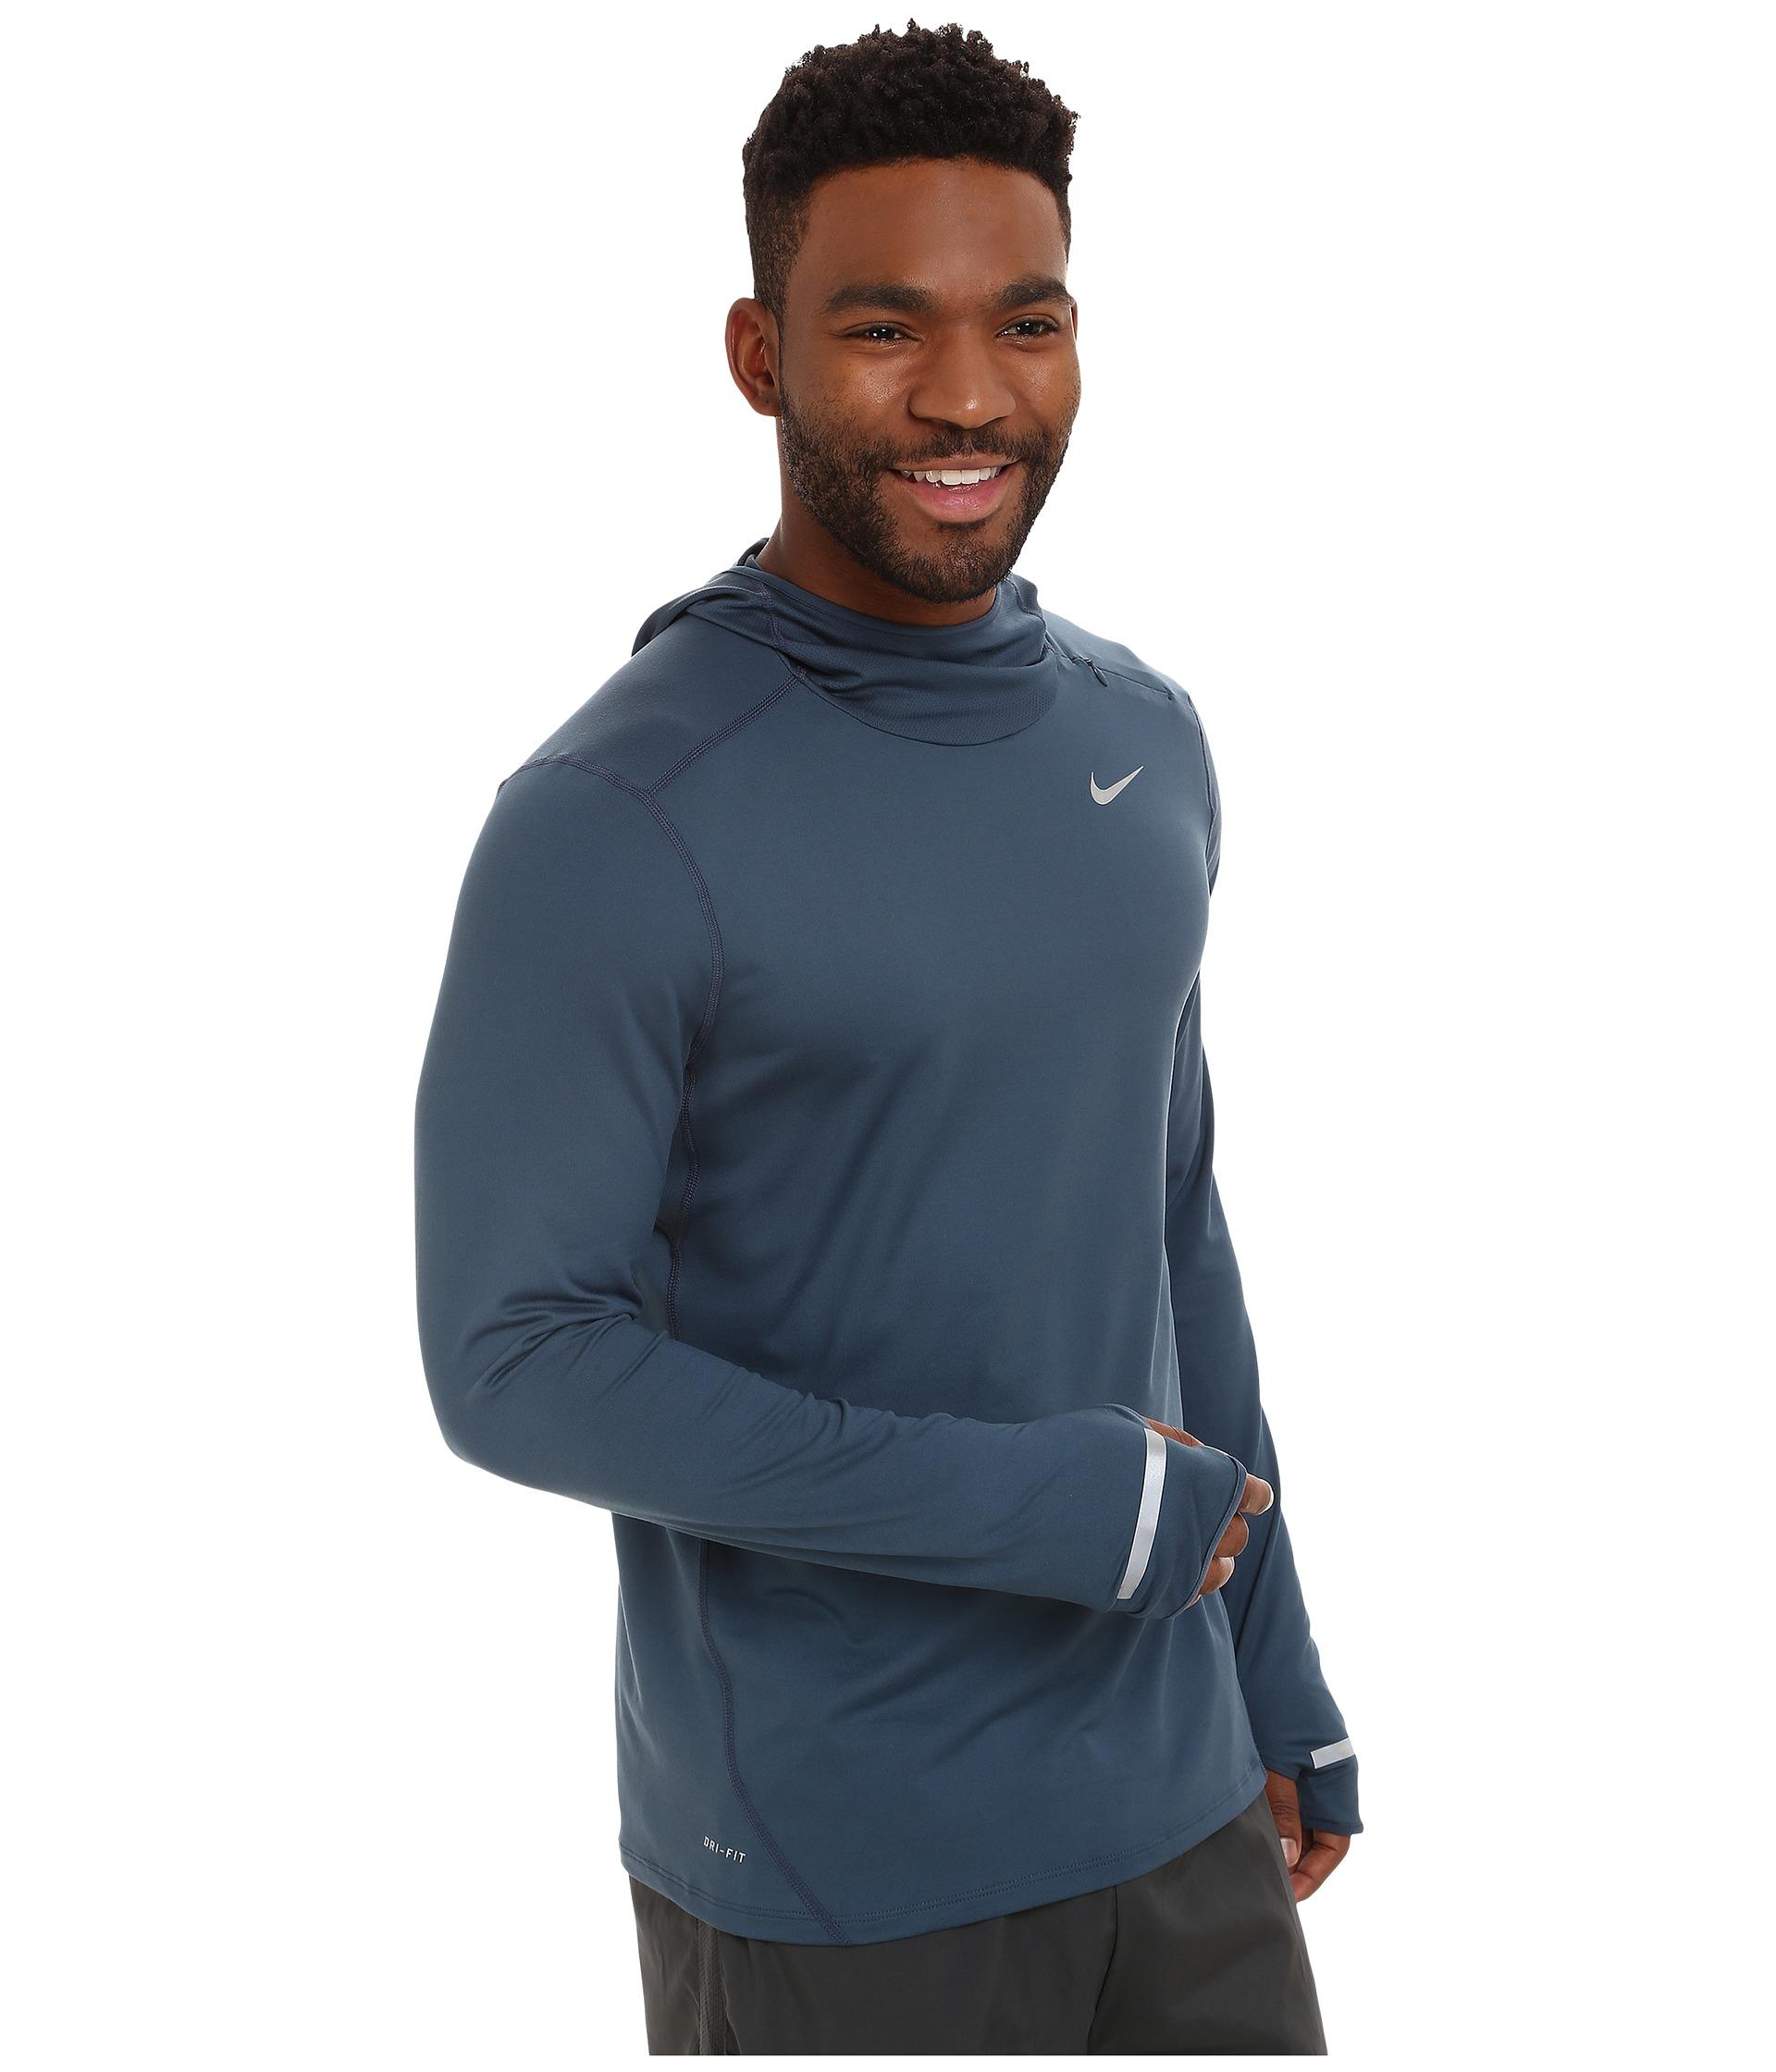 Nike element jacket men's - Gallery